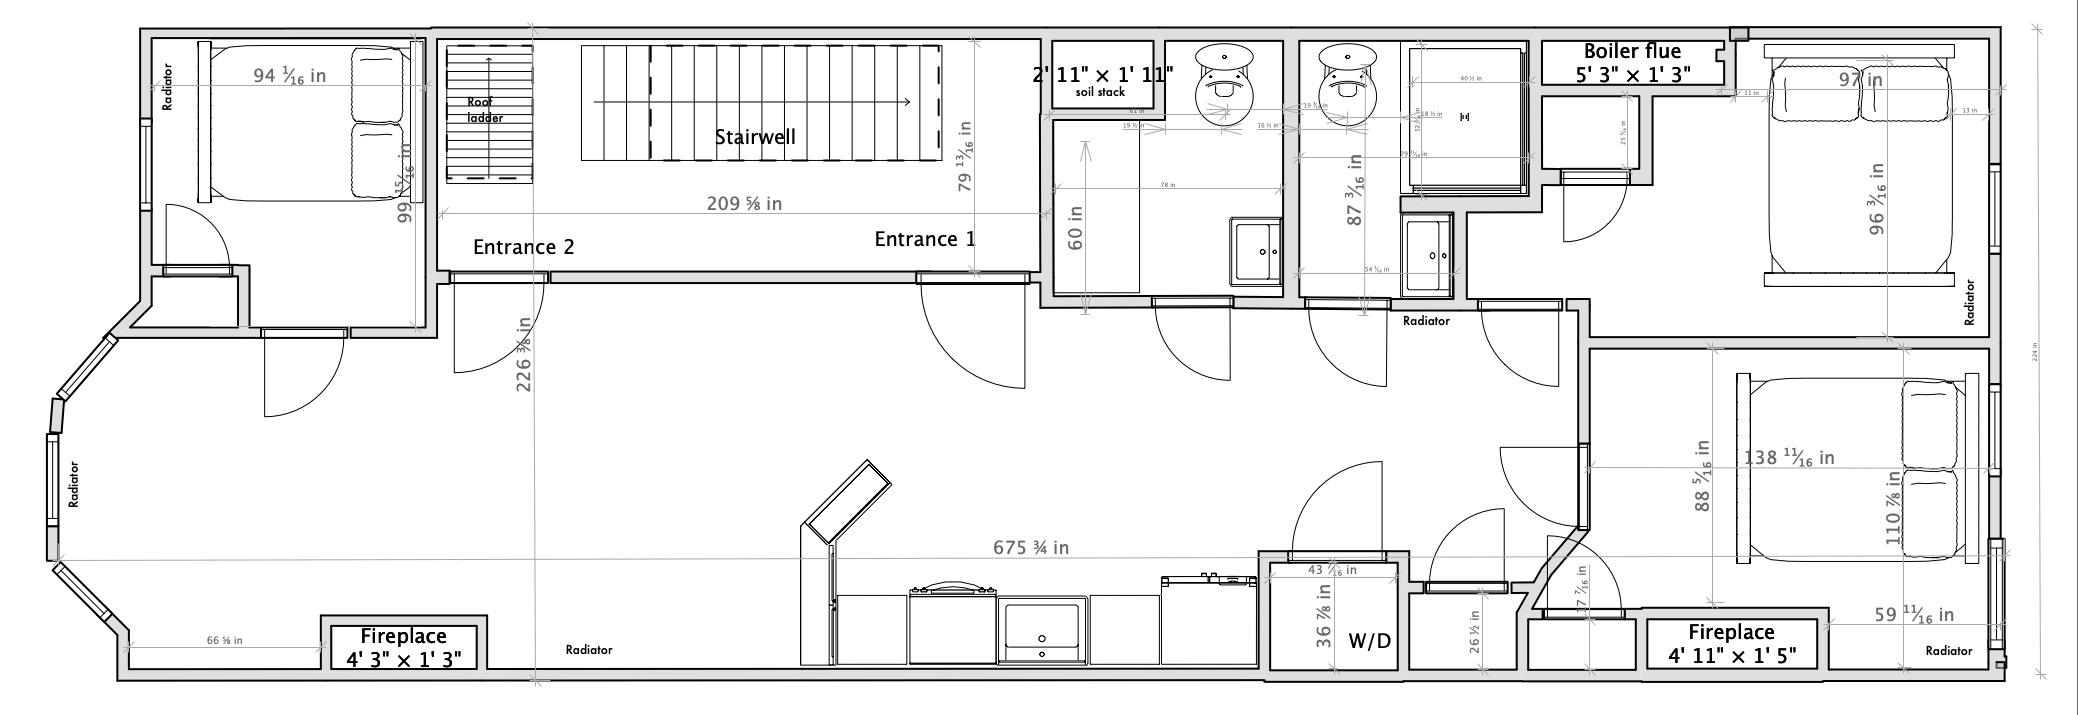 Bathroom layout question...-3rd-floor-layout.jpg